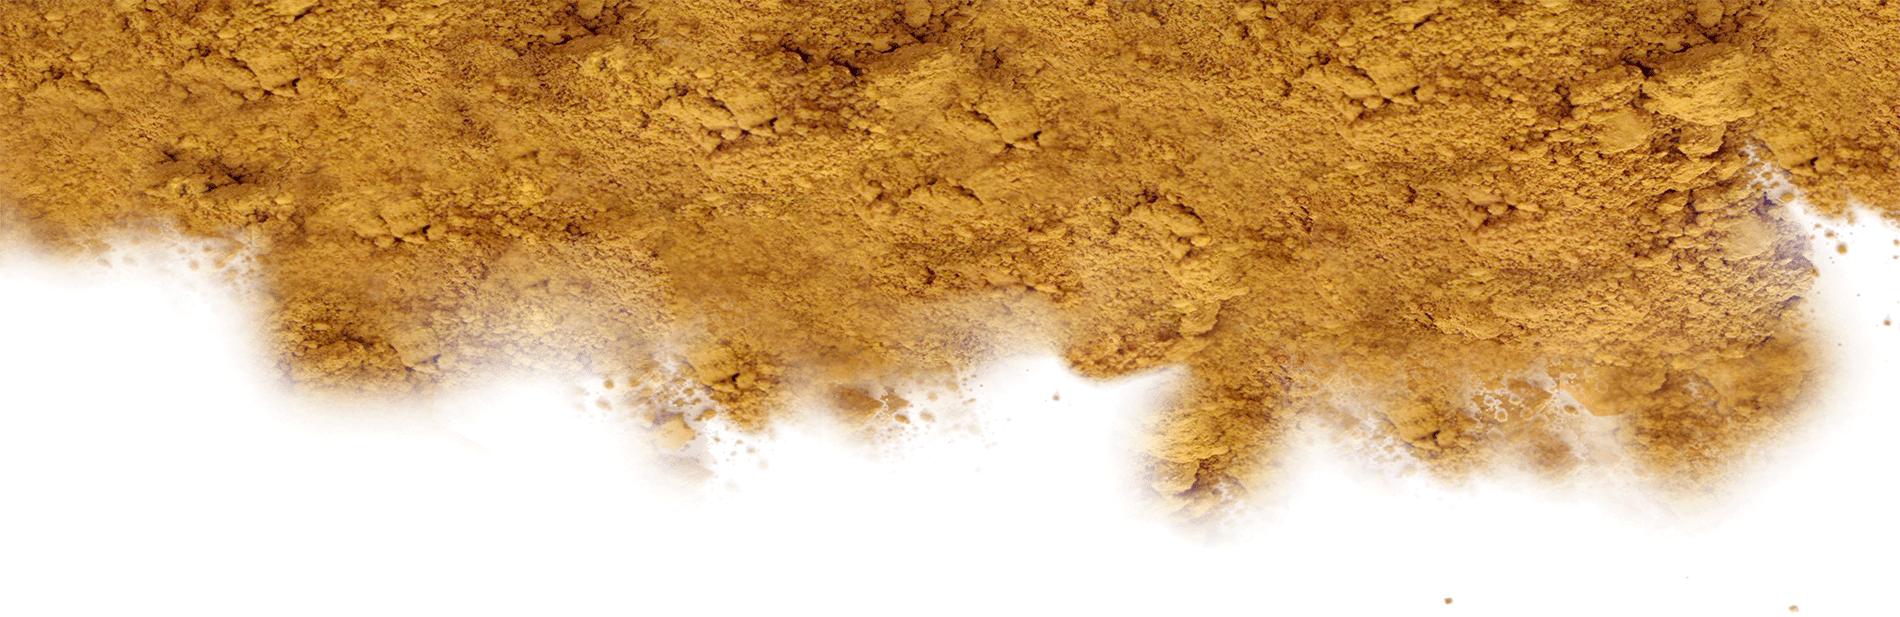 yellow-oxide